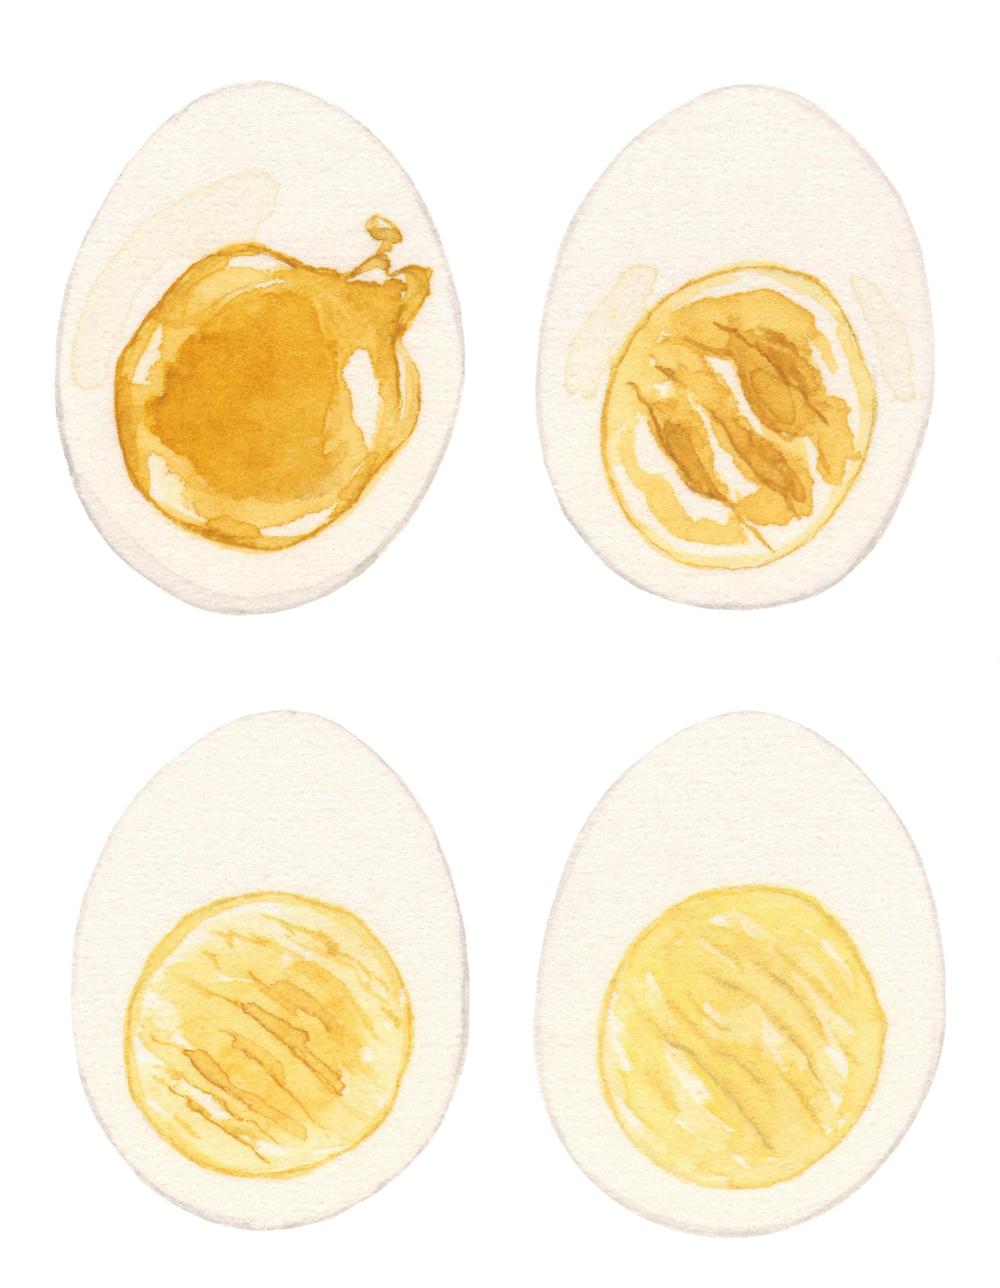 eggs-lrg.jpg